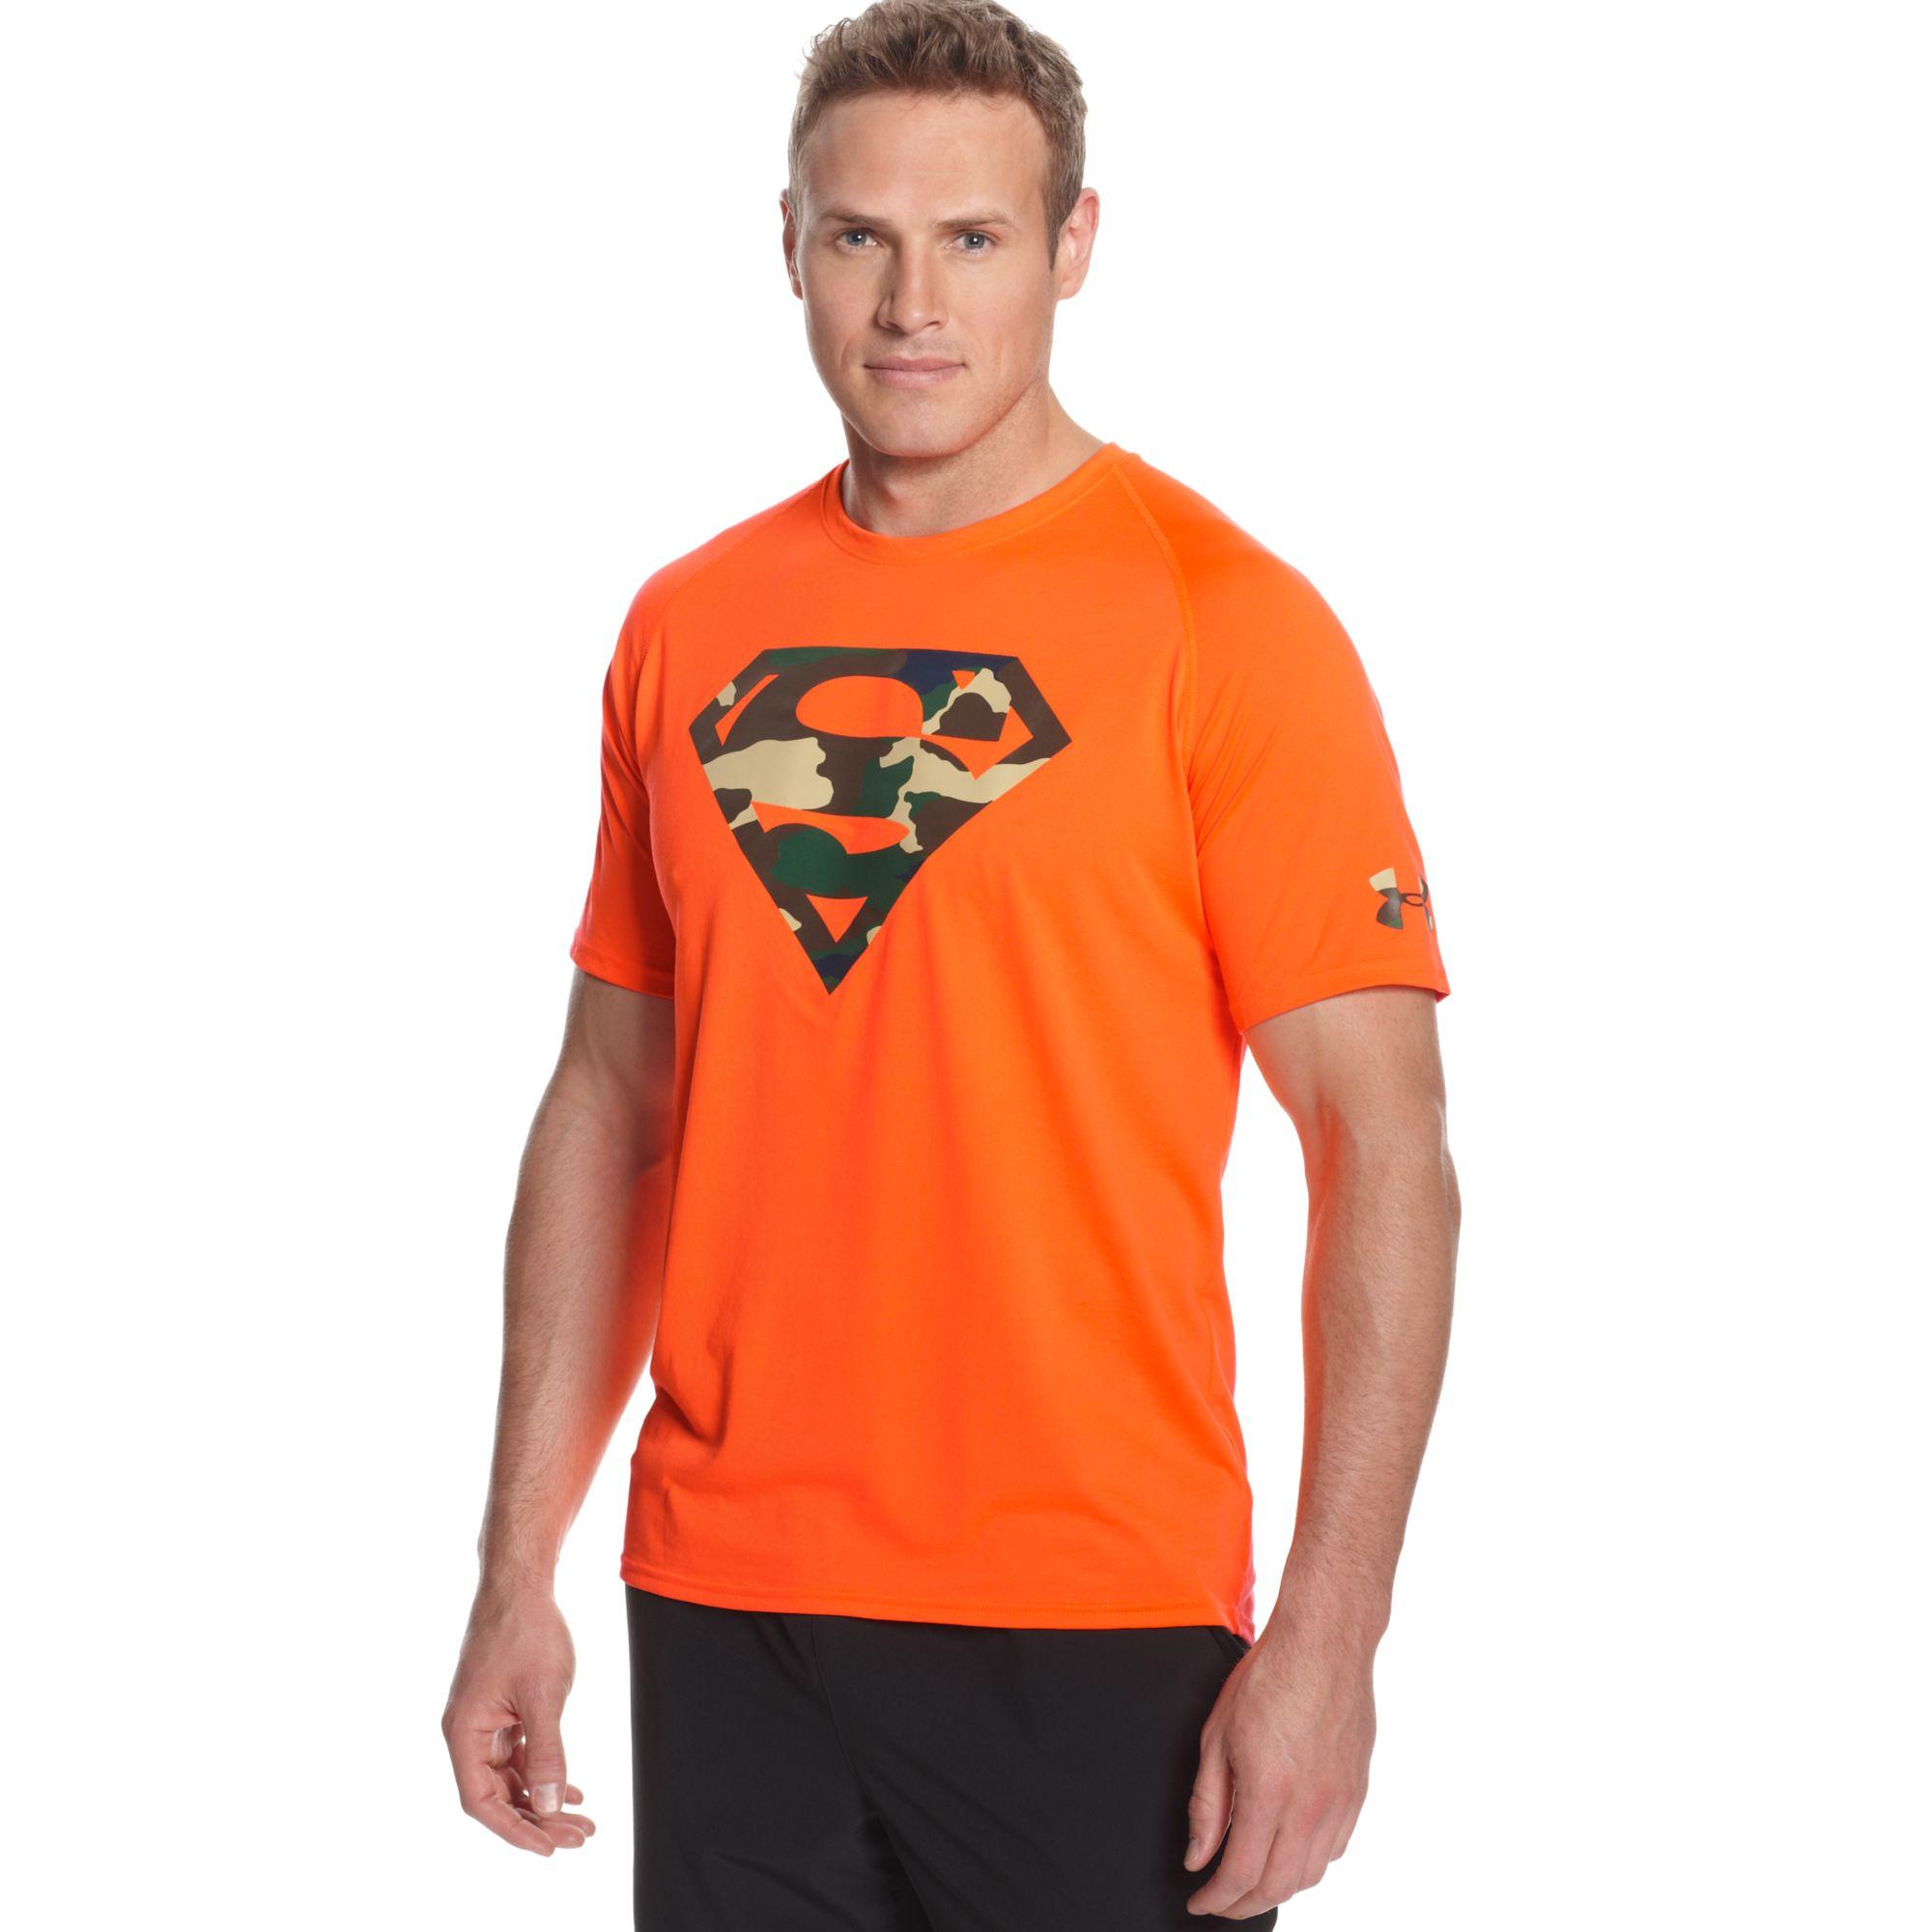 Under Armour Alter Ego Shirts Mens